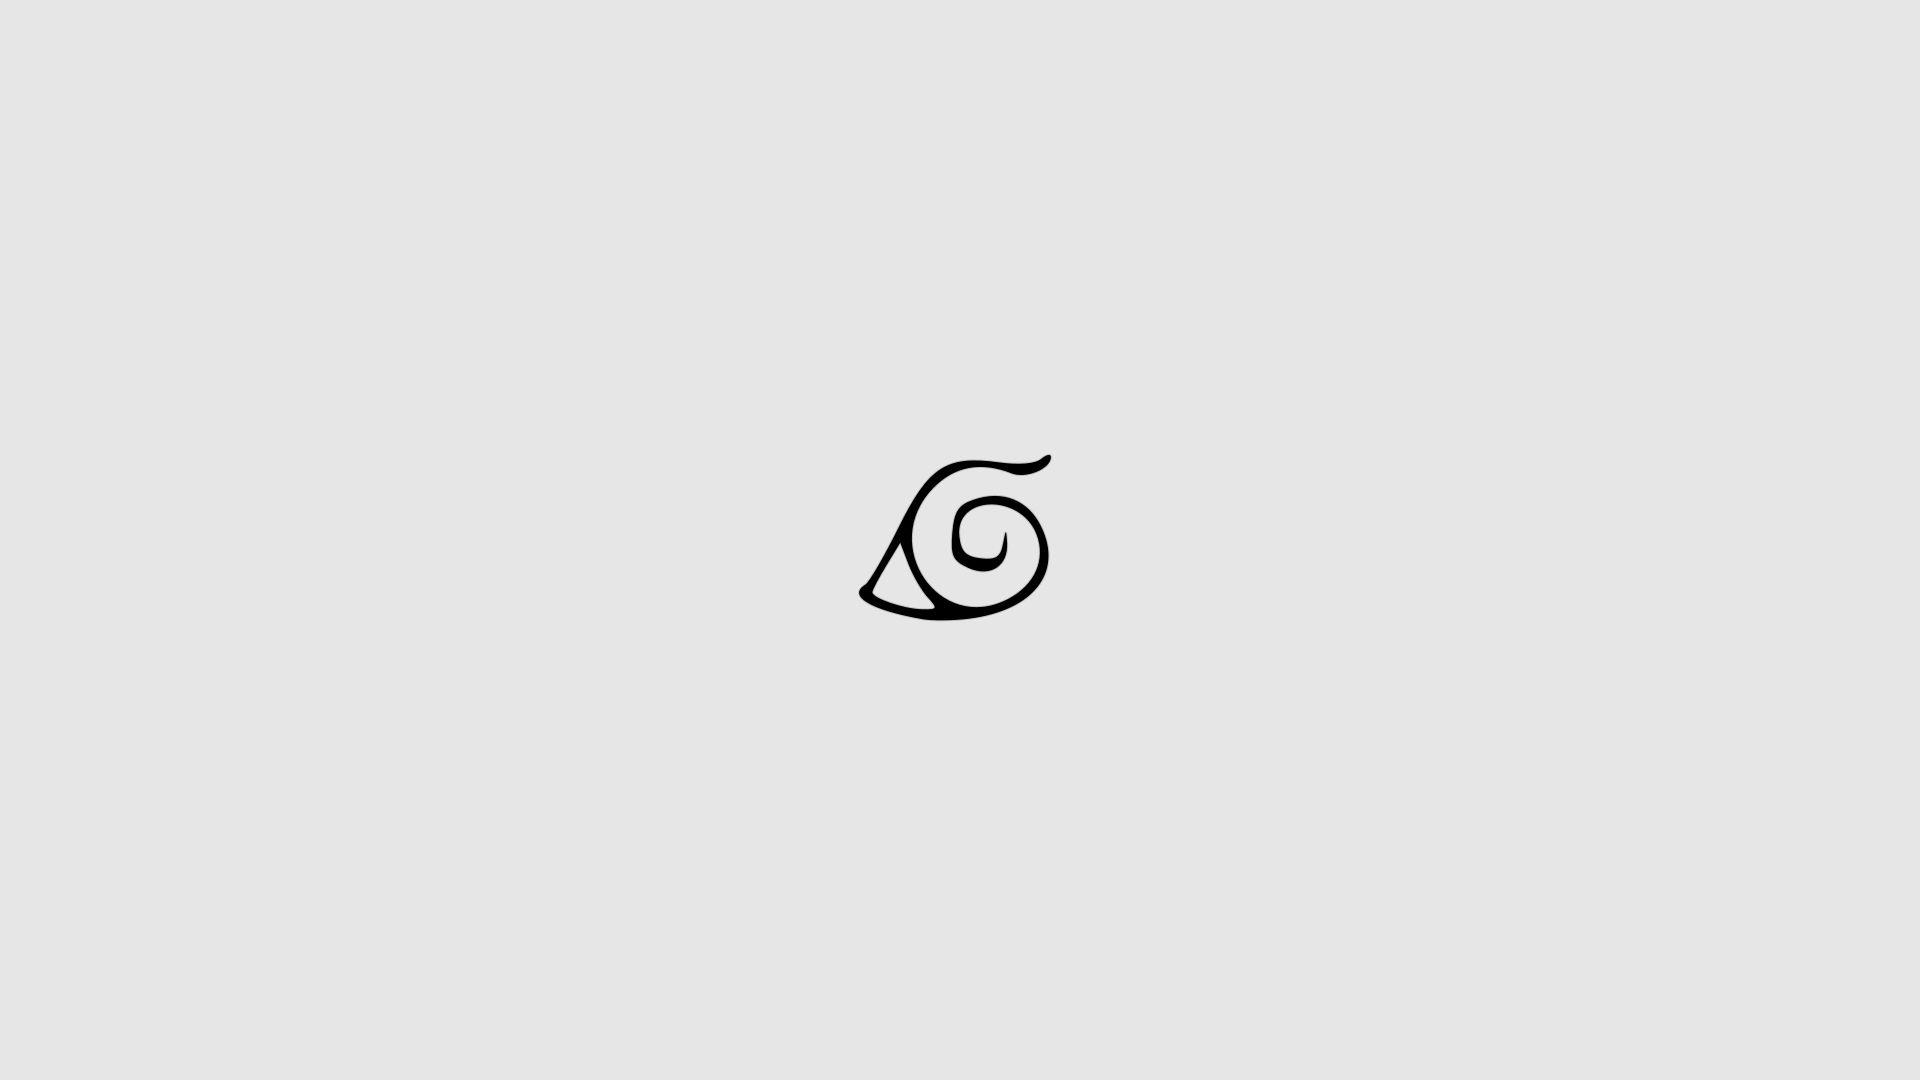 Naruto Minimalist, Wallpaper